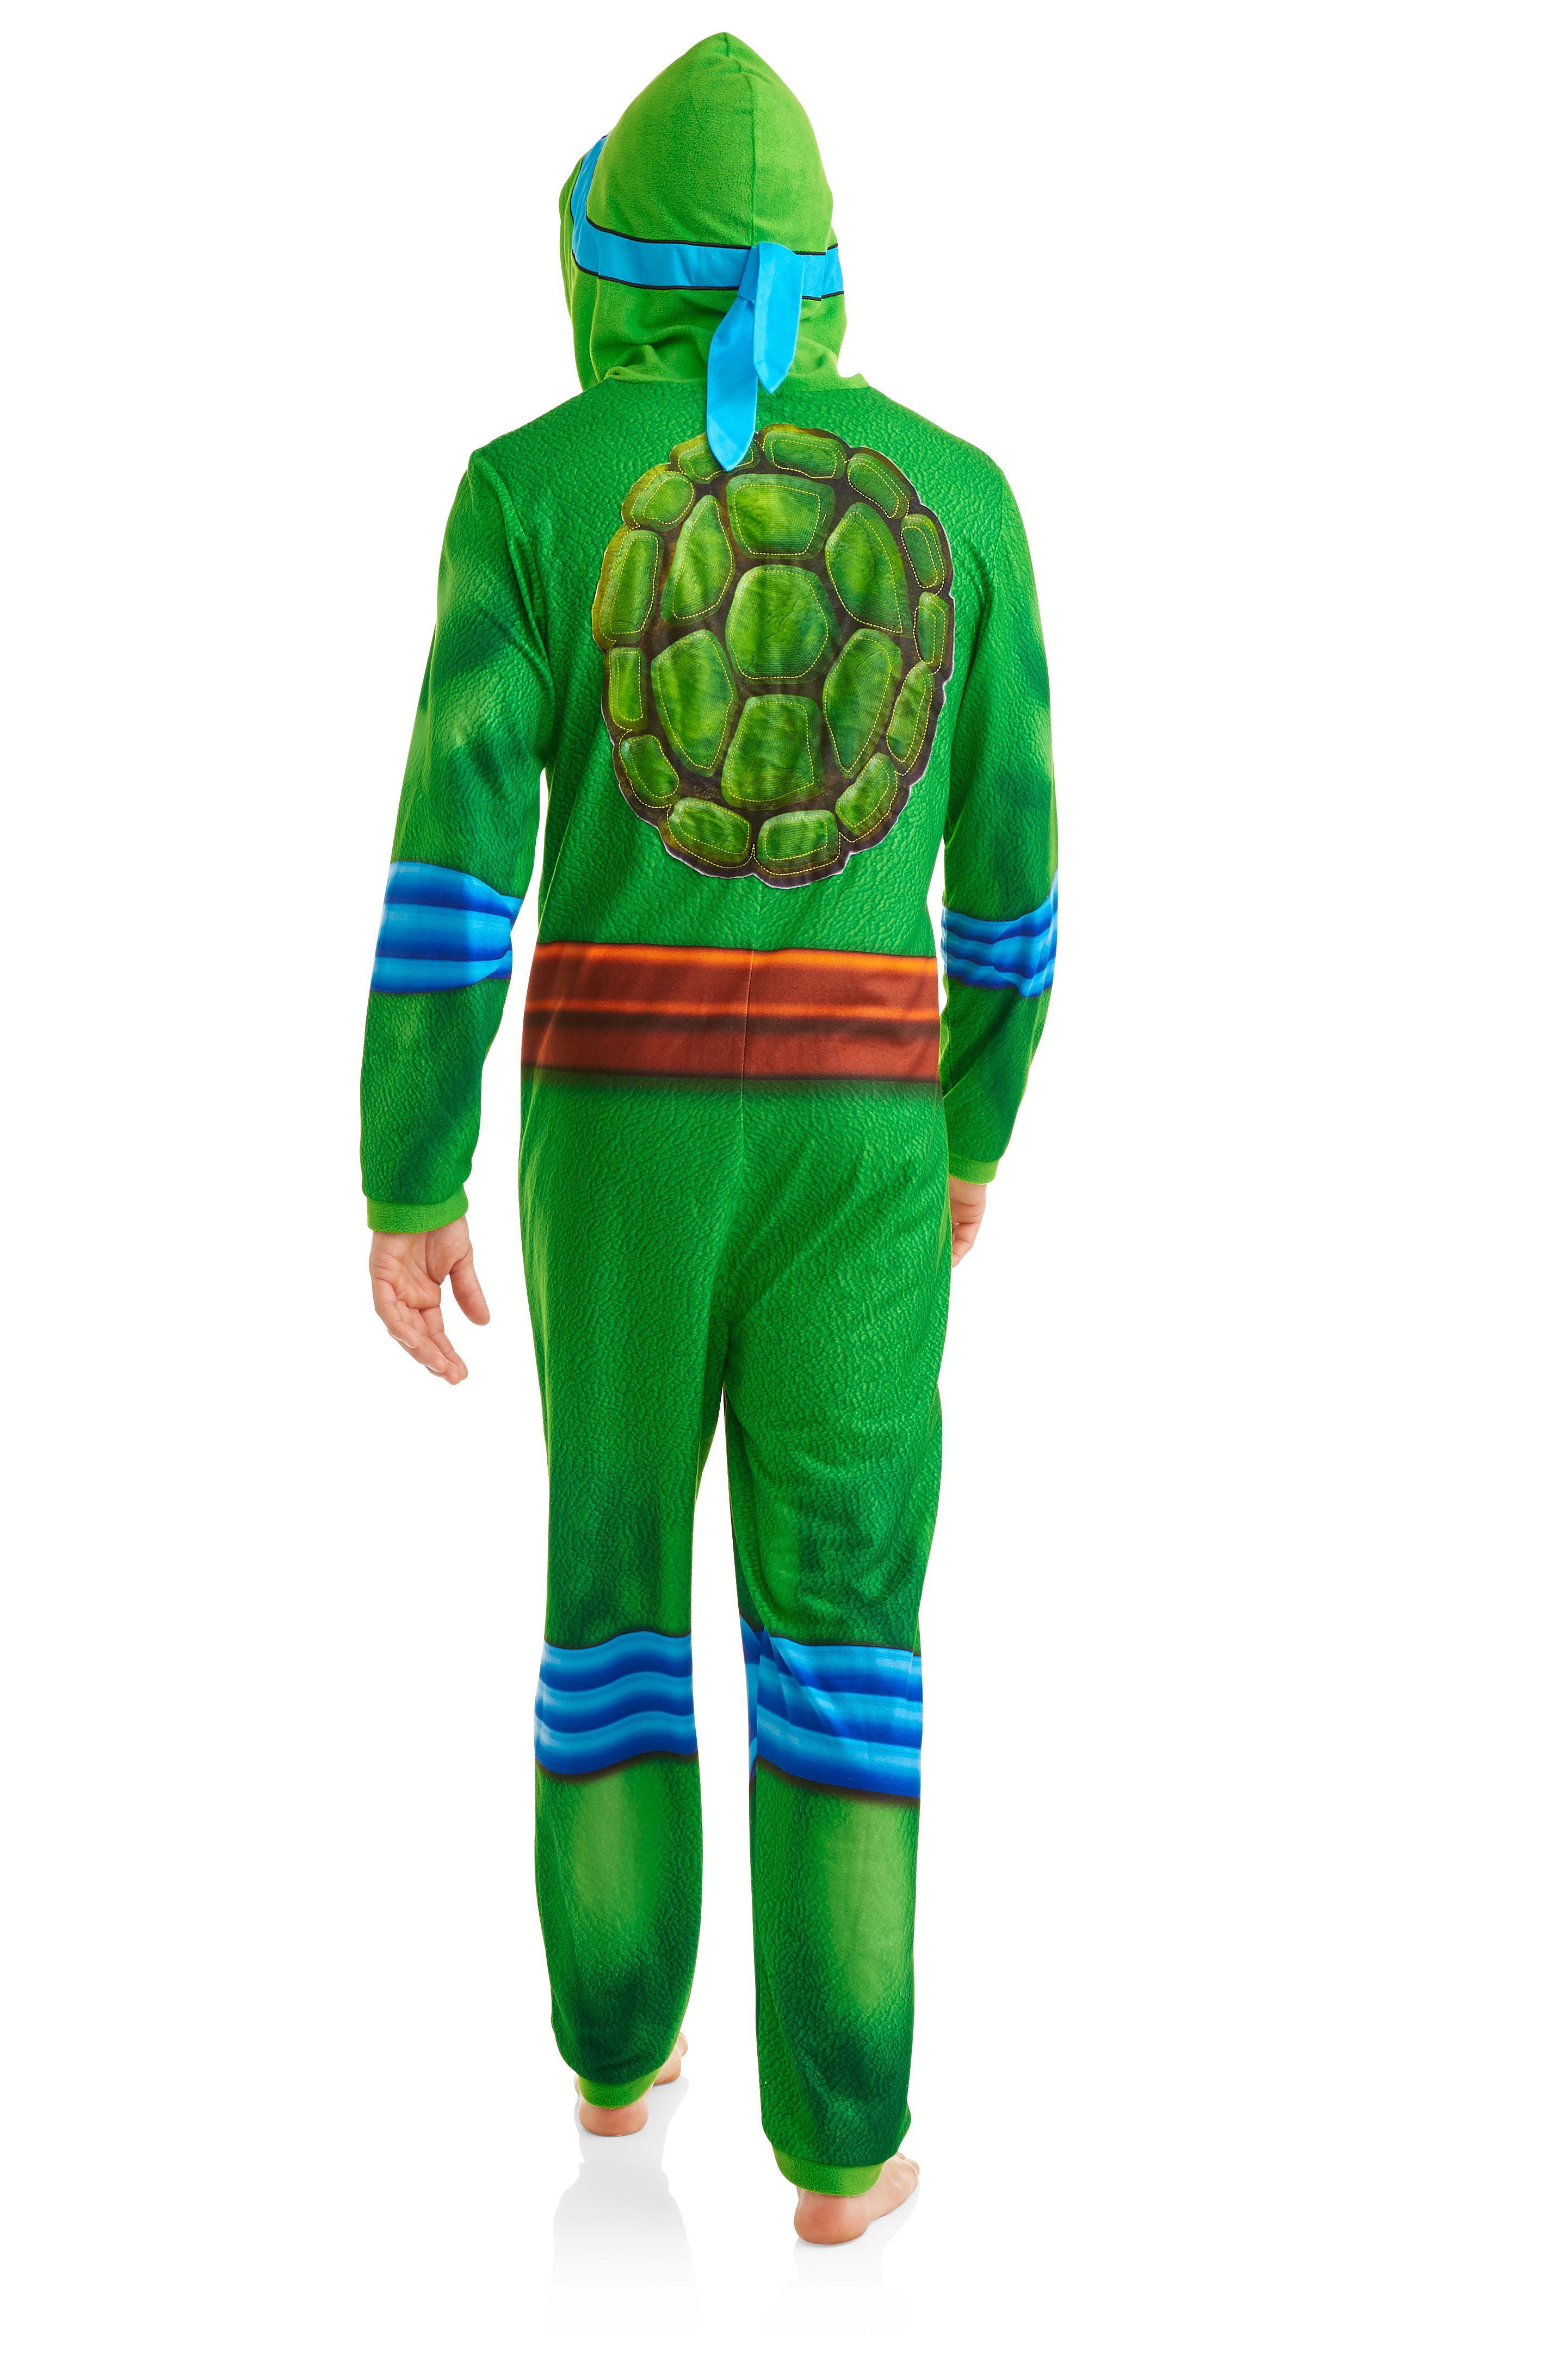 5e0d0234f Teenage Mutant Ninja Turtle Men s Onesie Union Suit - Walmart.com